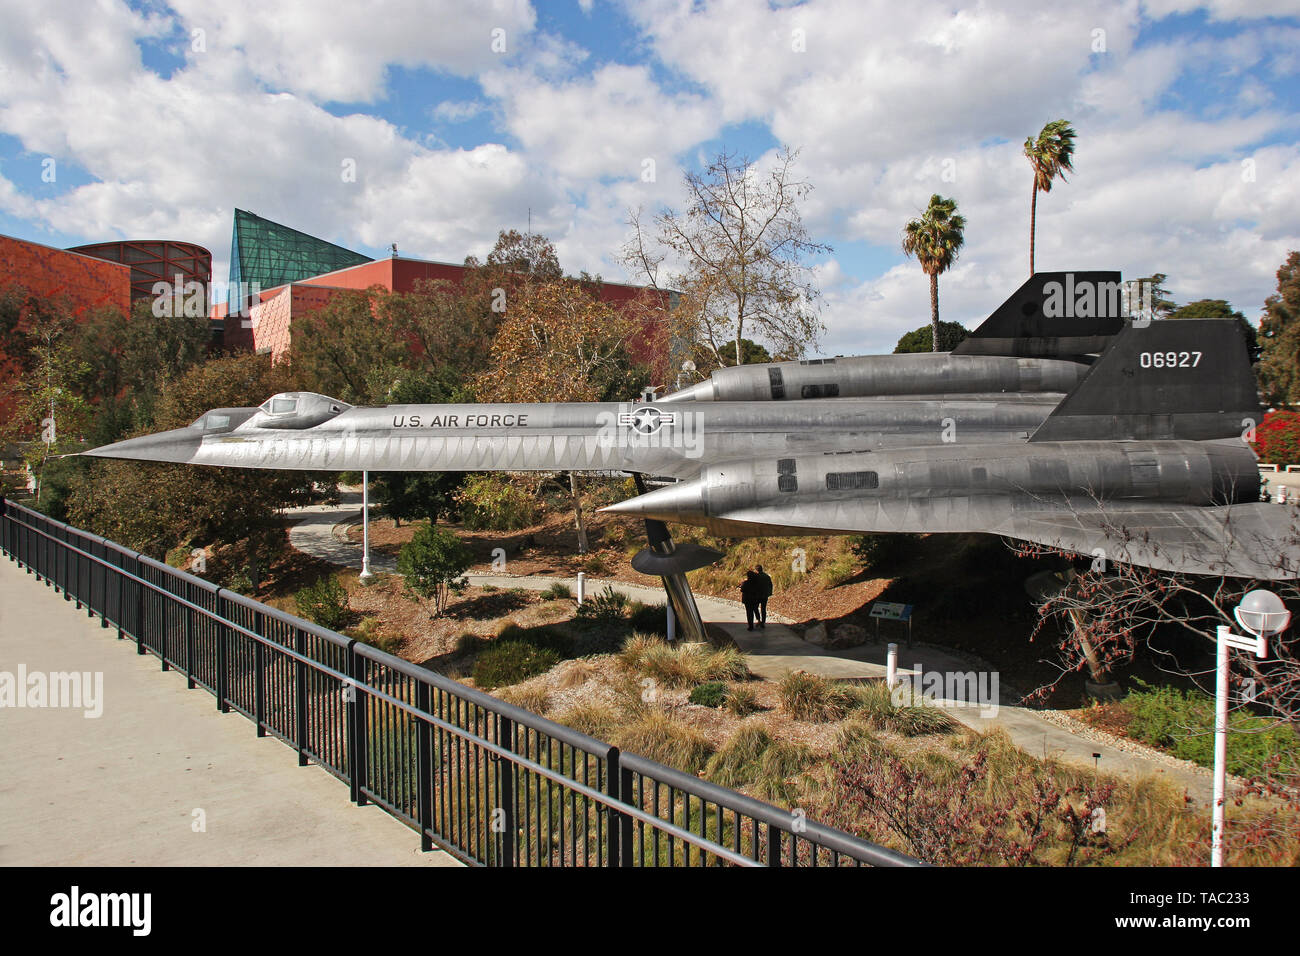 Lockheed SR 71 Blackbird plane on display in Exposition Park Los Angeles Stock Photo